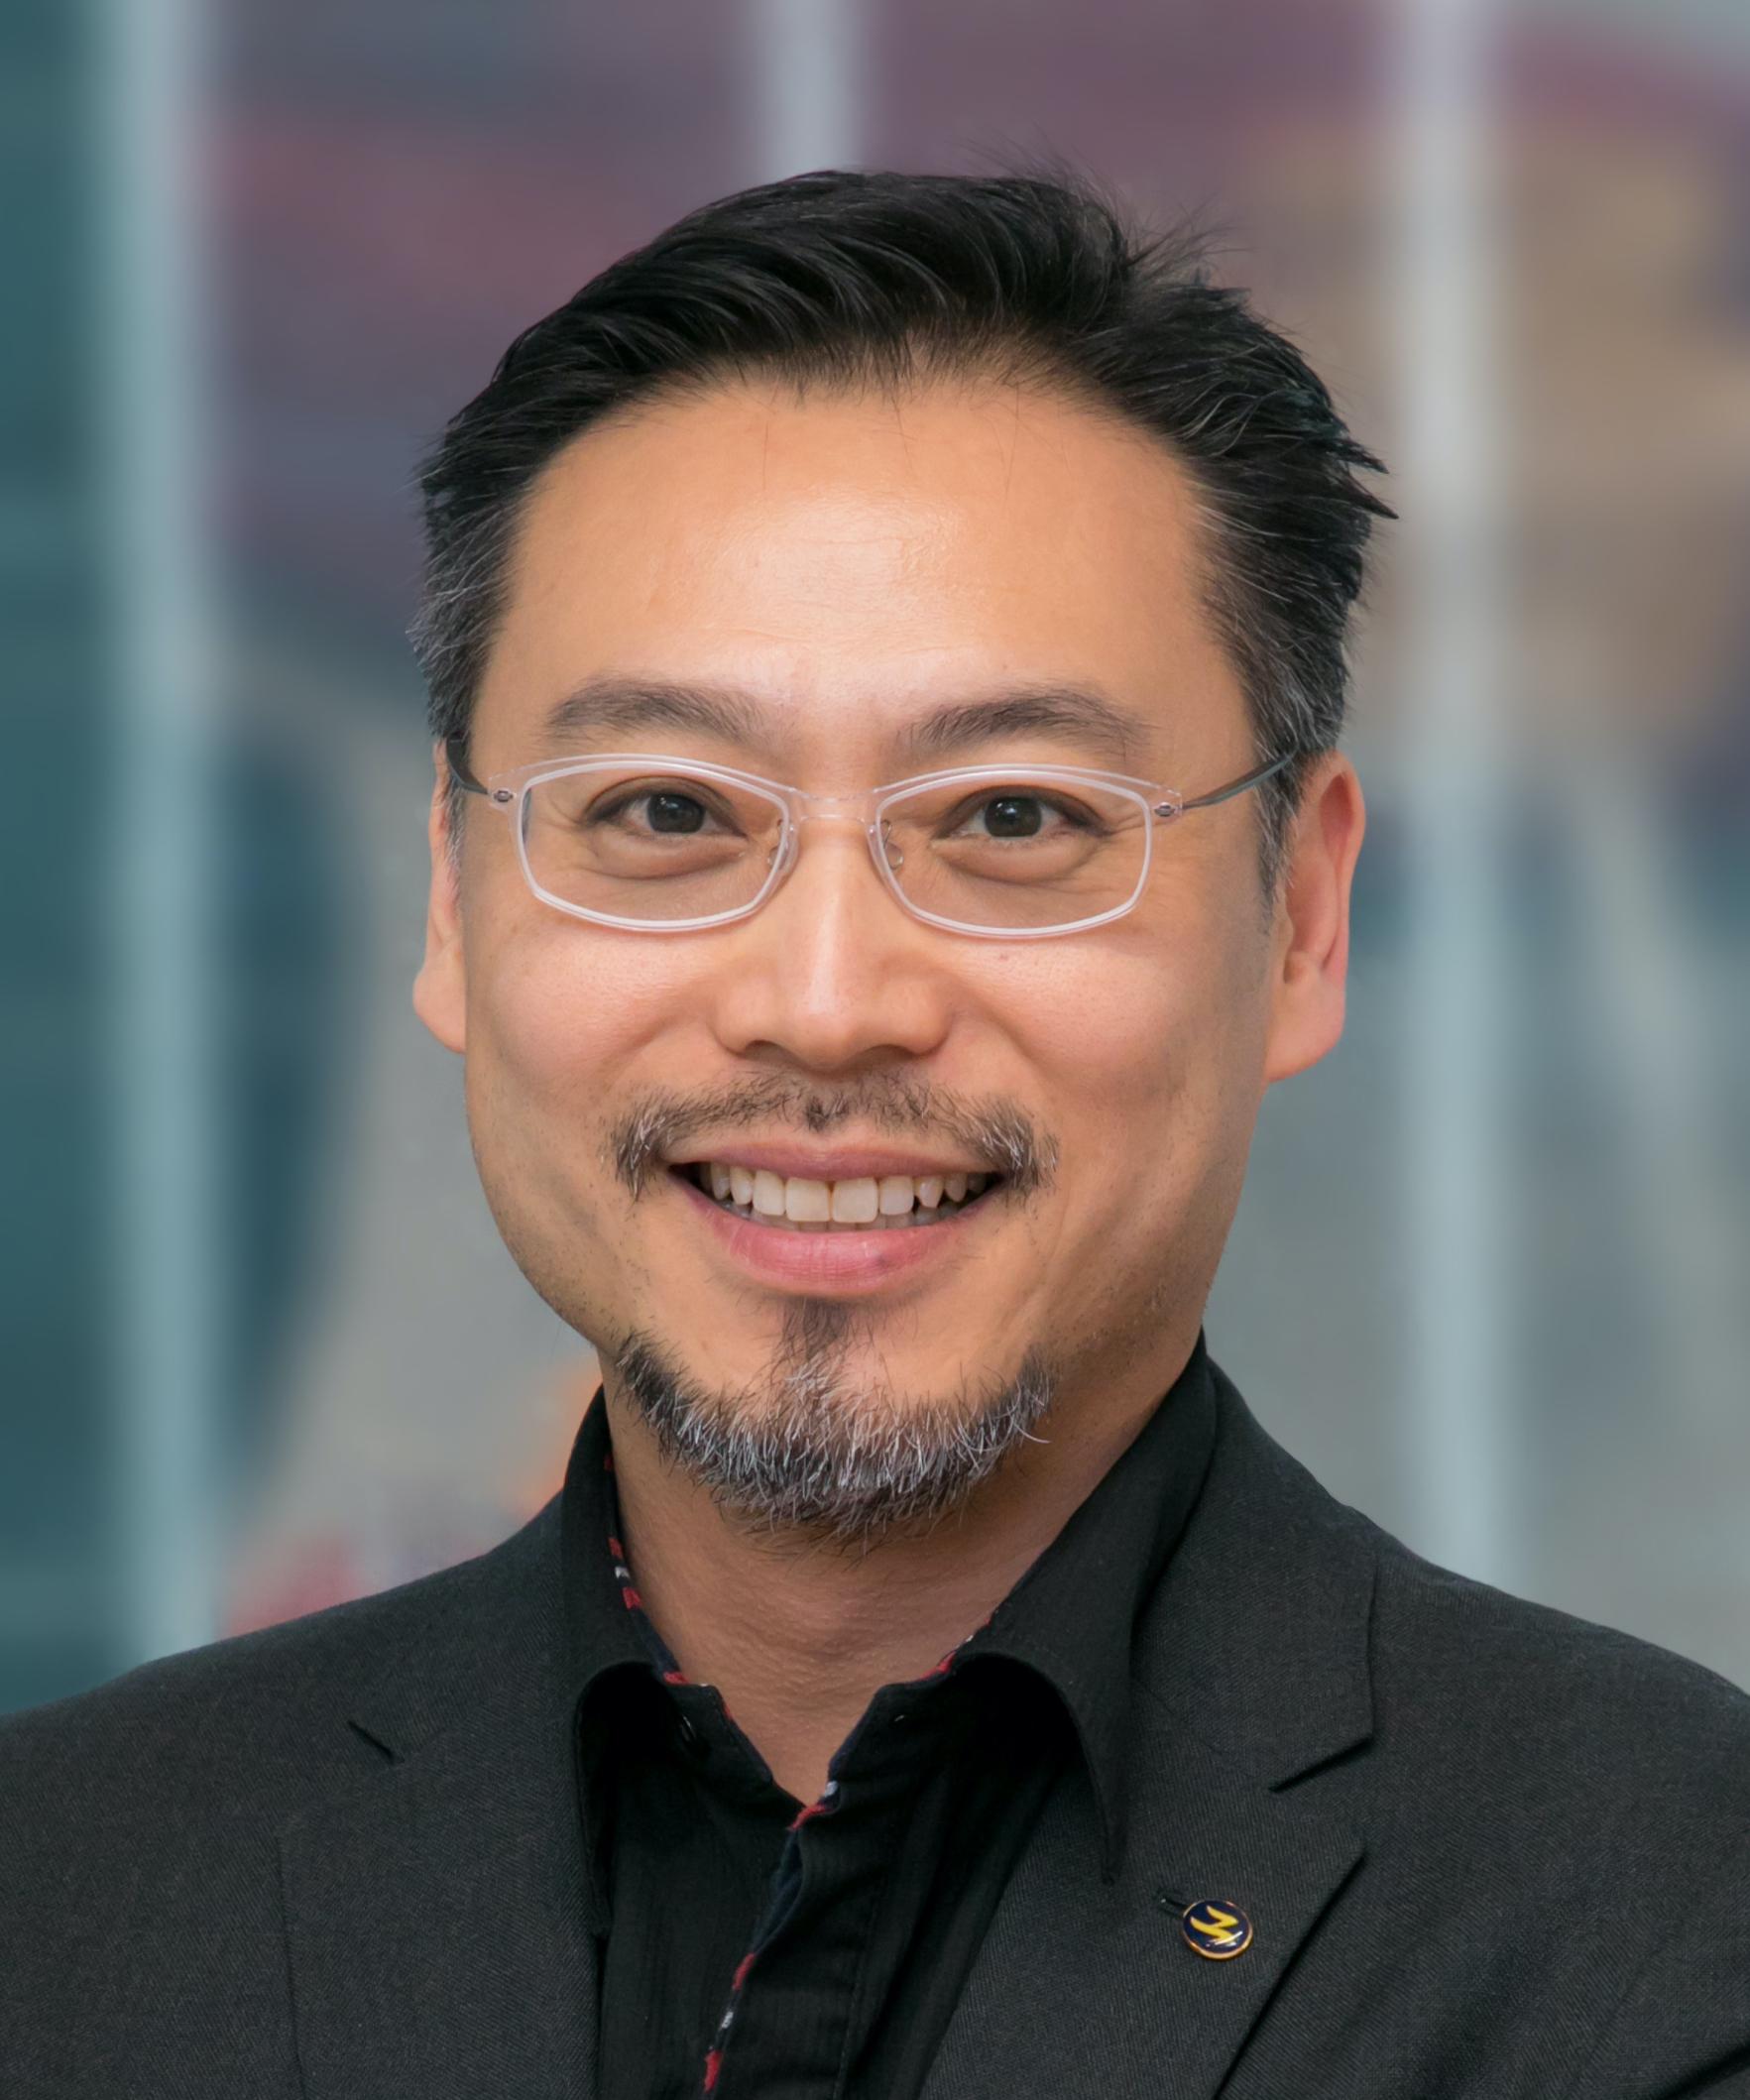 Mr. Jason Chiu